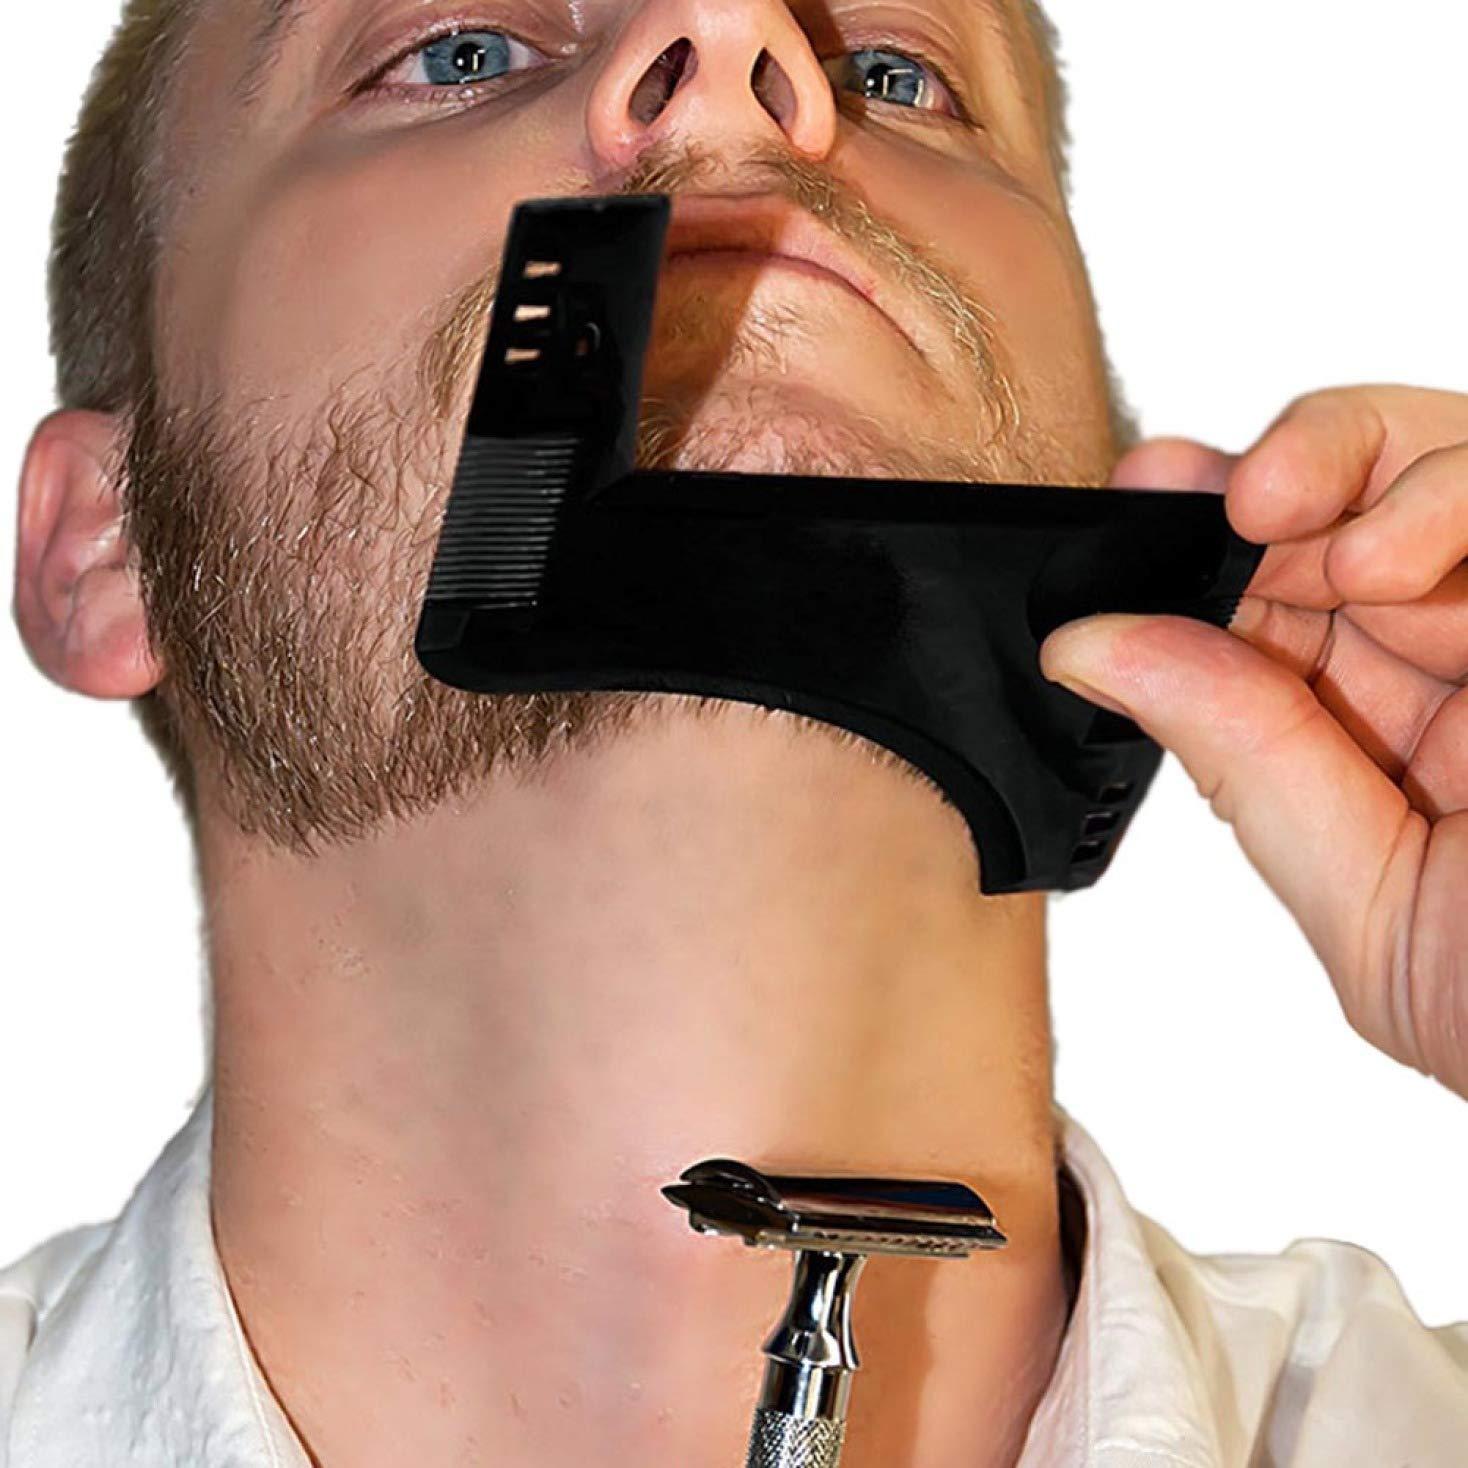 BoshILun Beard Comb Beard Shaper Facial Hair Shaping Tool Comb Gentleman Beard Trim Moustache Template Hair Cut Molding Men Father Gift None Black @